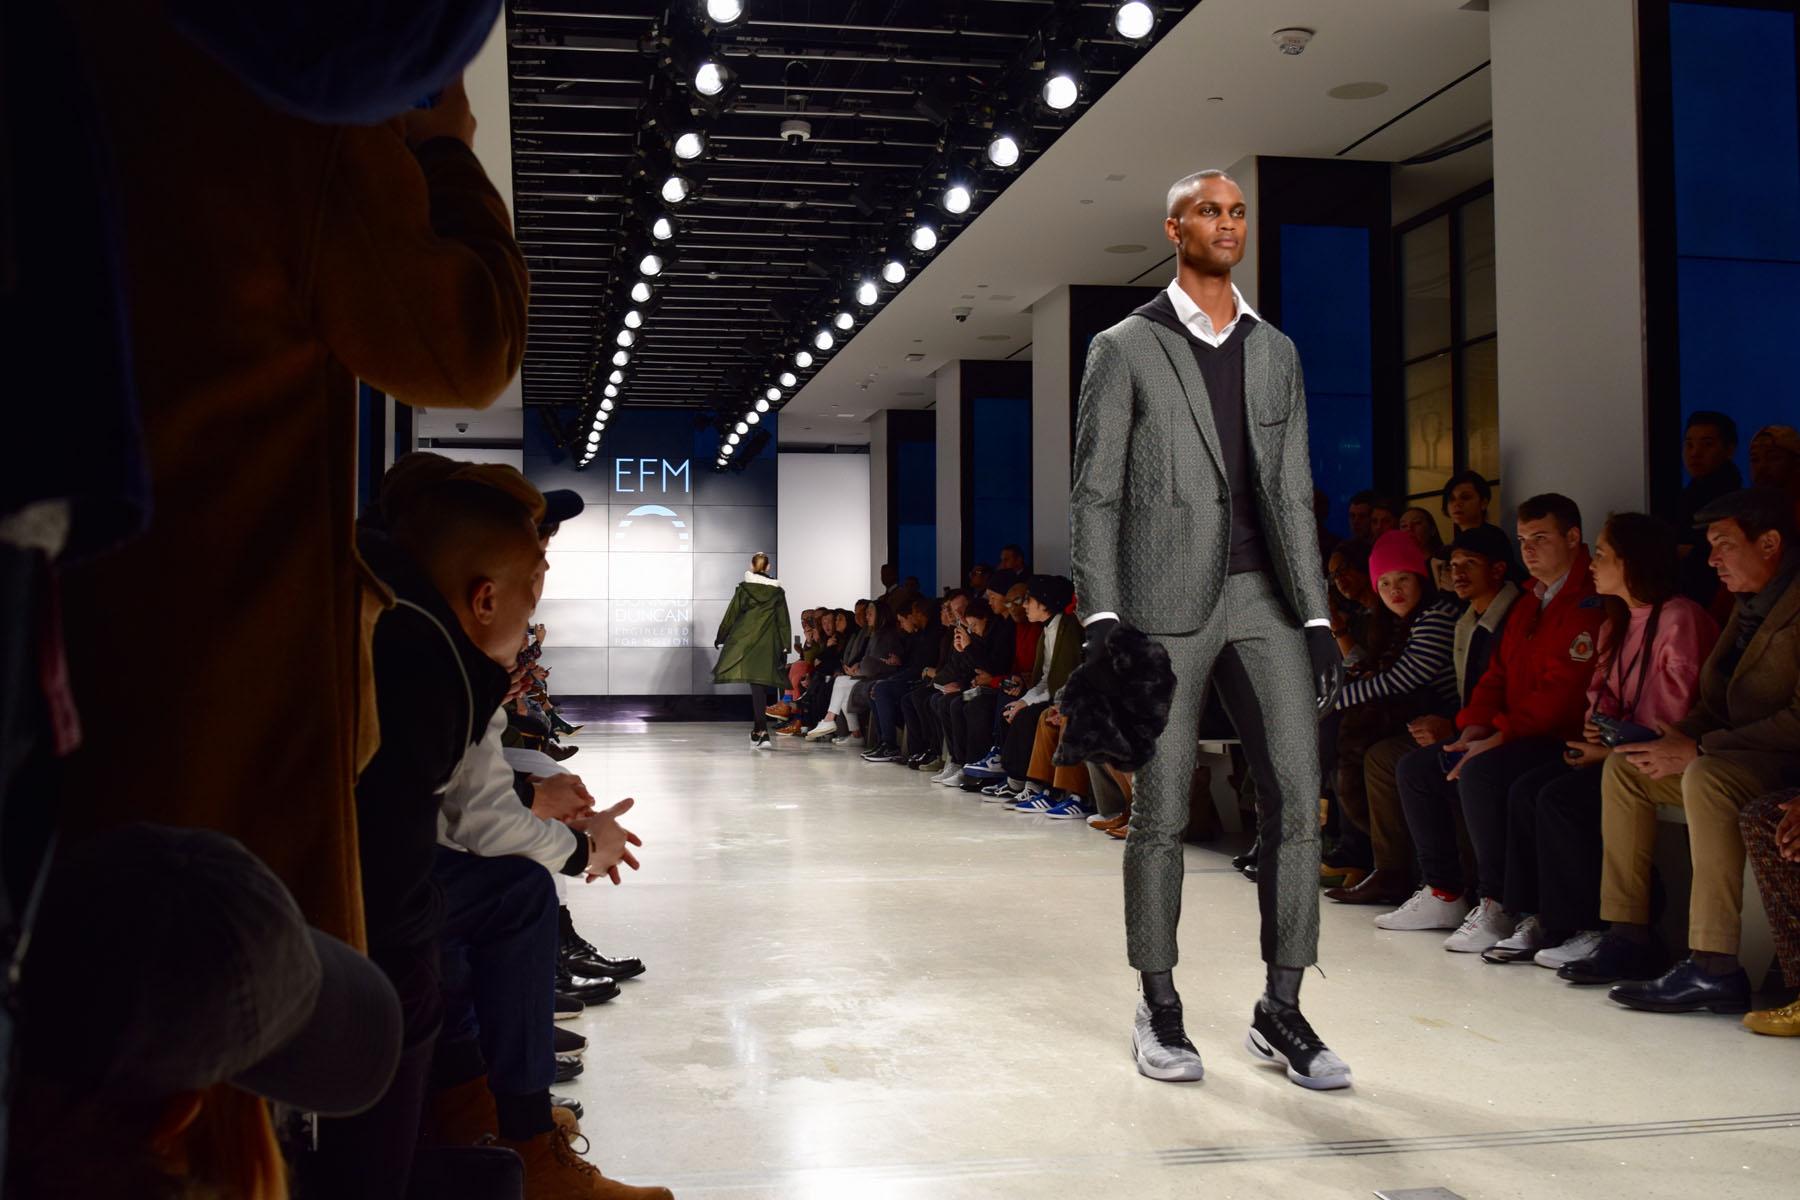 EFM-fall-2017-fashion-show-mens-the-impression-33